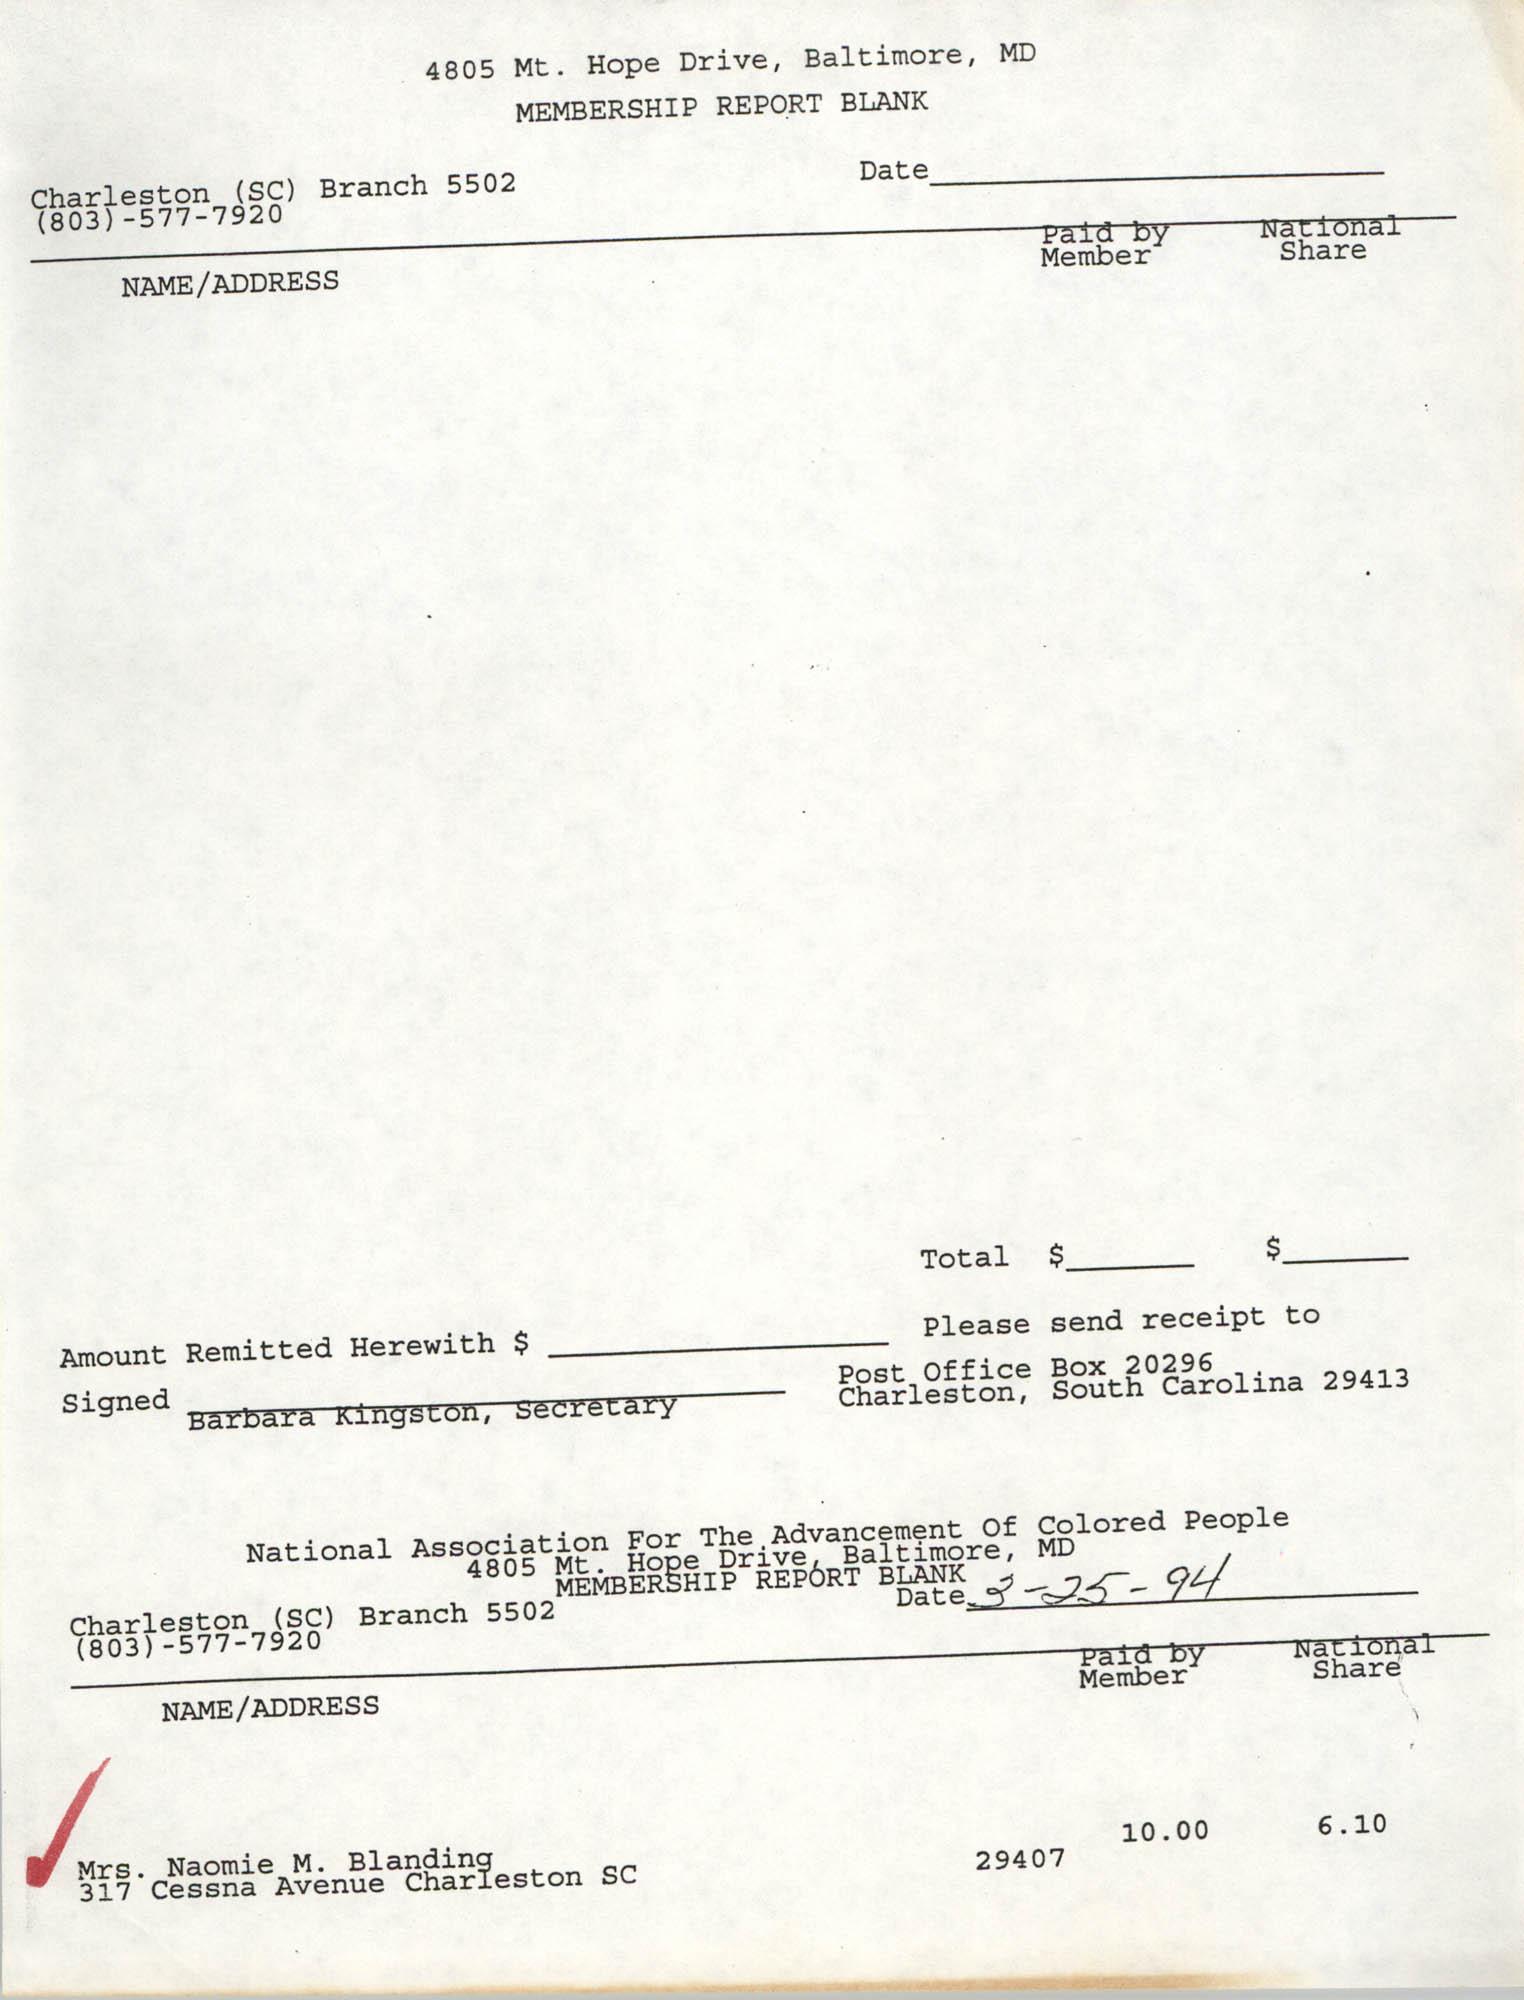 Membership Report Blank, Charleston Branch of the NAACP, Barbara Kingston, March 25, 1994